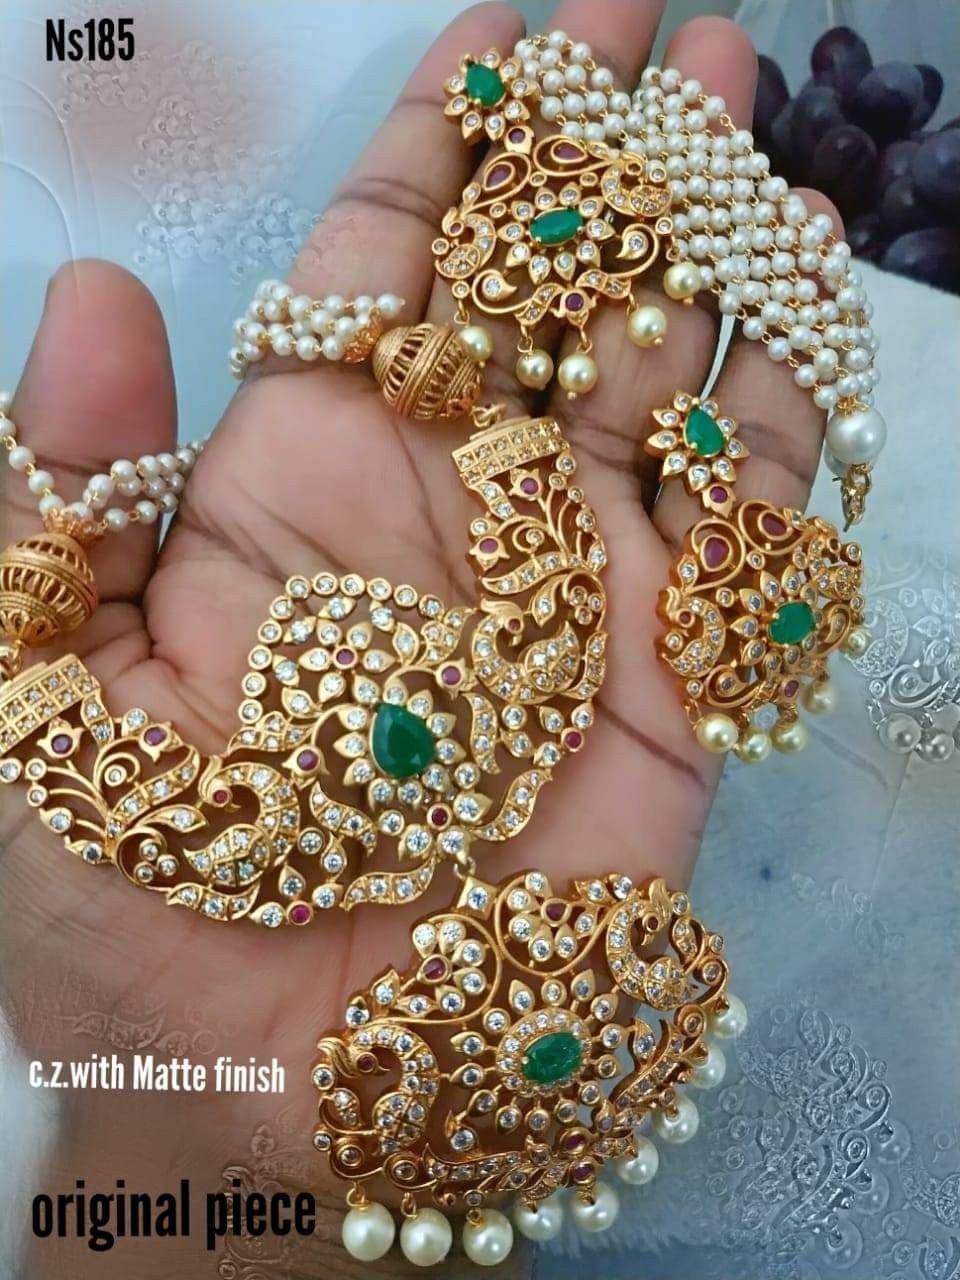 Body piercing near me  Pin by mrudula navudu on Jewellery junkie  Pinterest  Jewelry